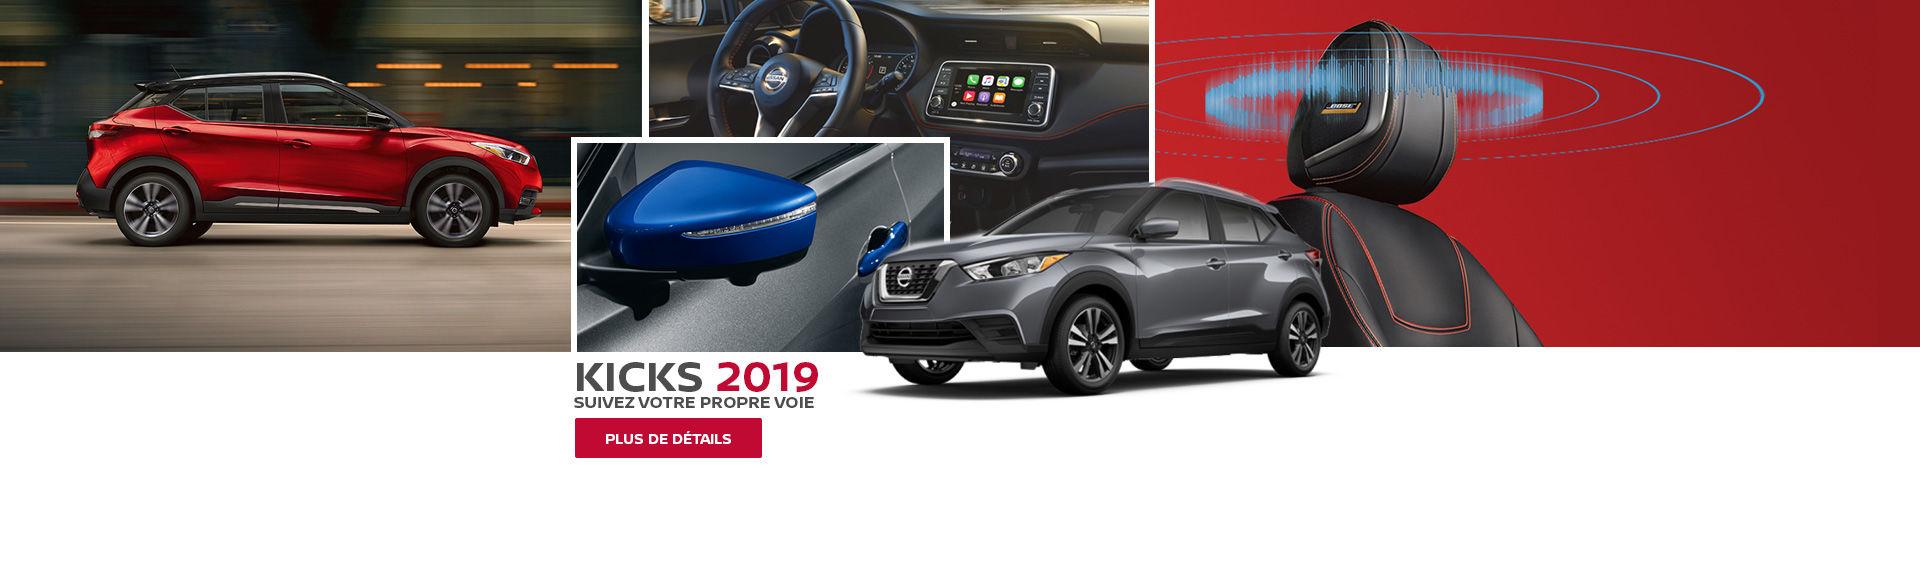 Kicks 2019 Alma Nissan